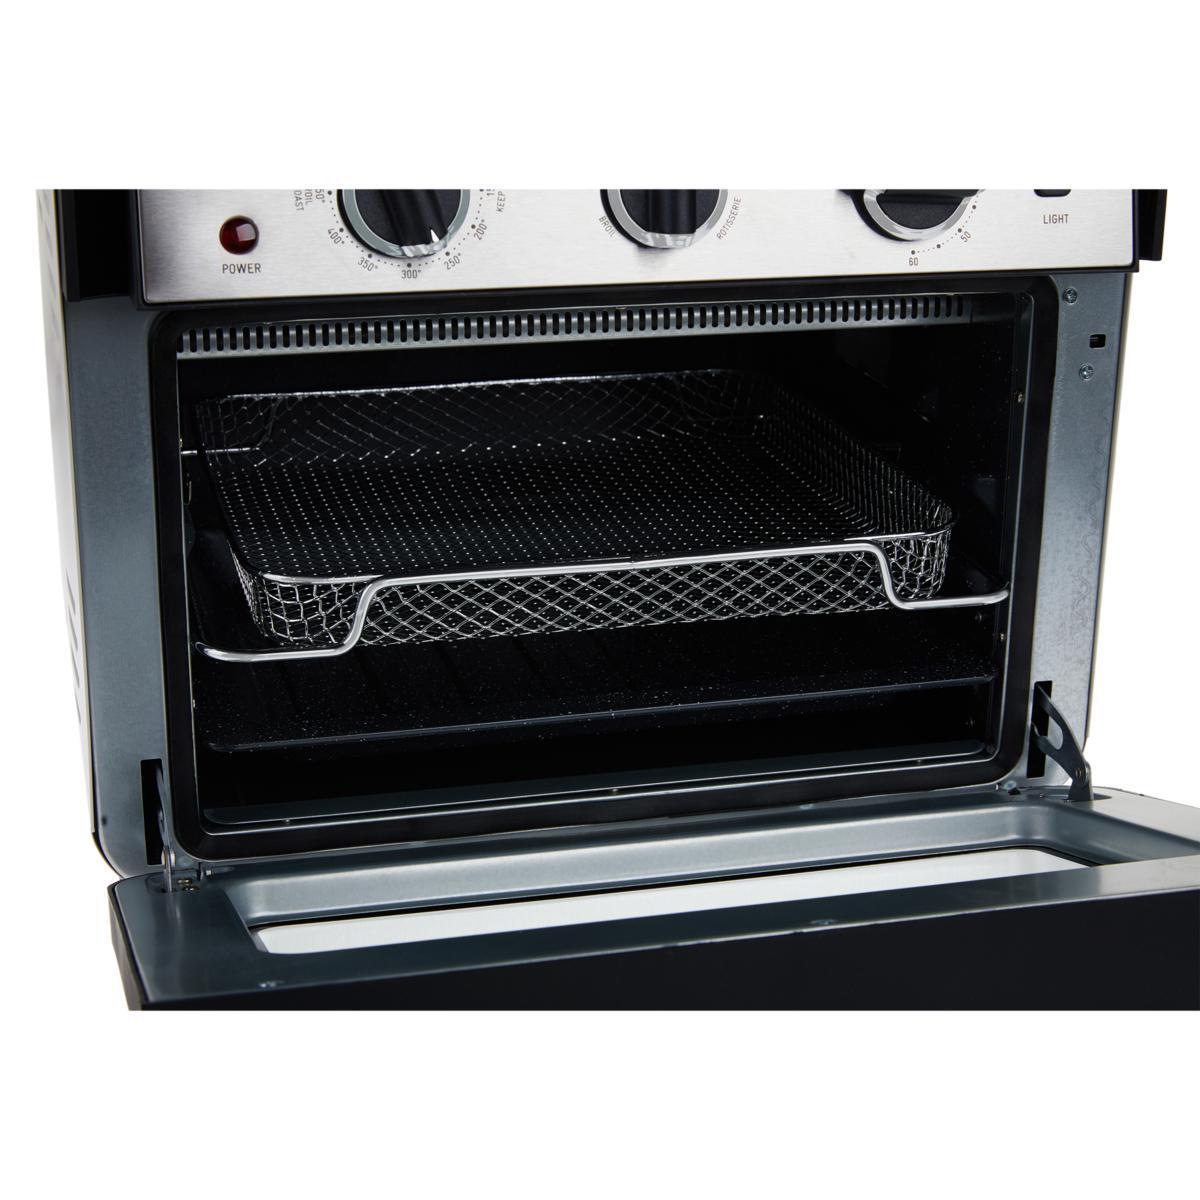 Mini Oven/Air Fryer Curtis Stone Dura-Electric 679-725 - Black/Silver